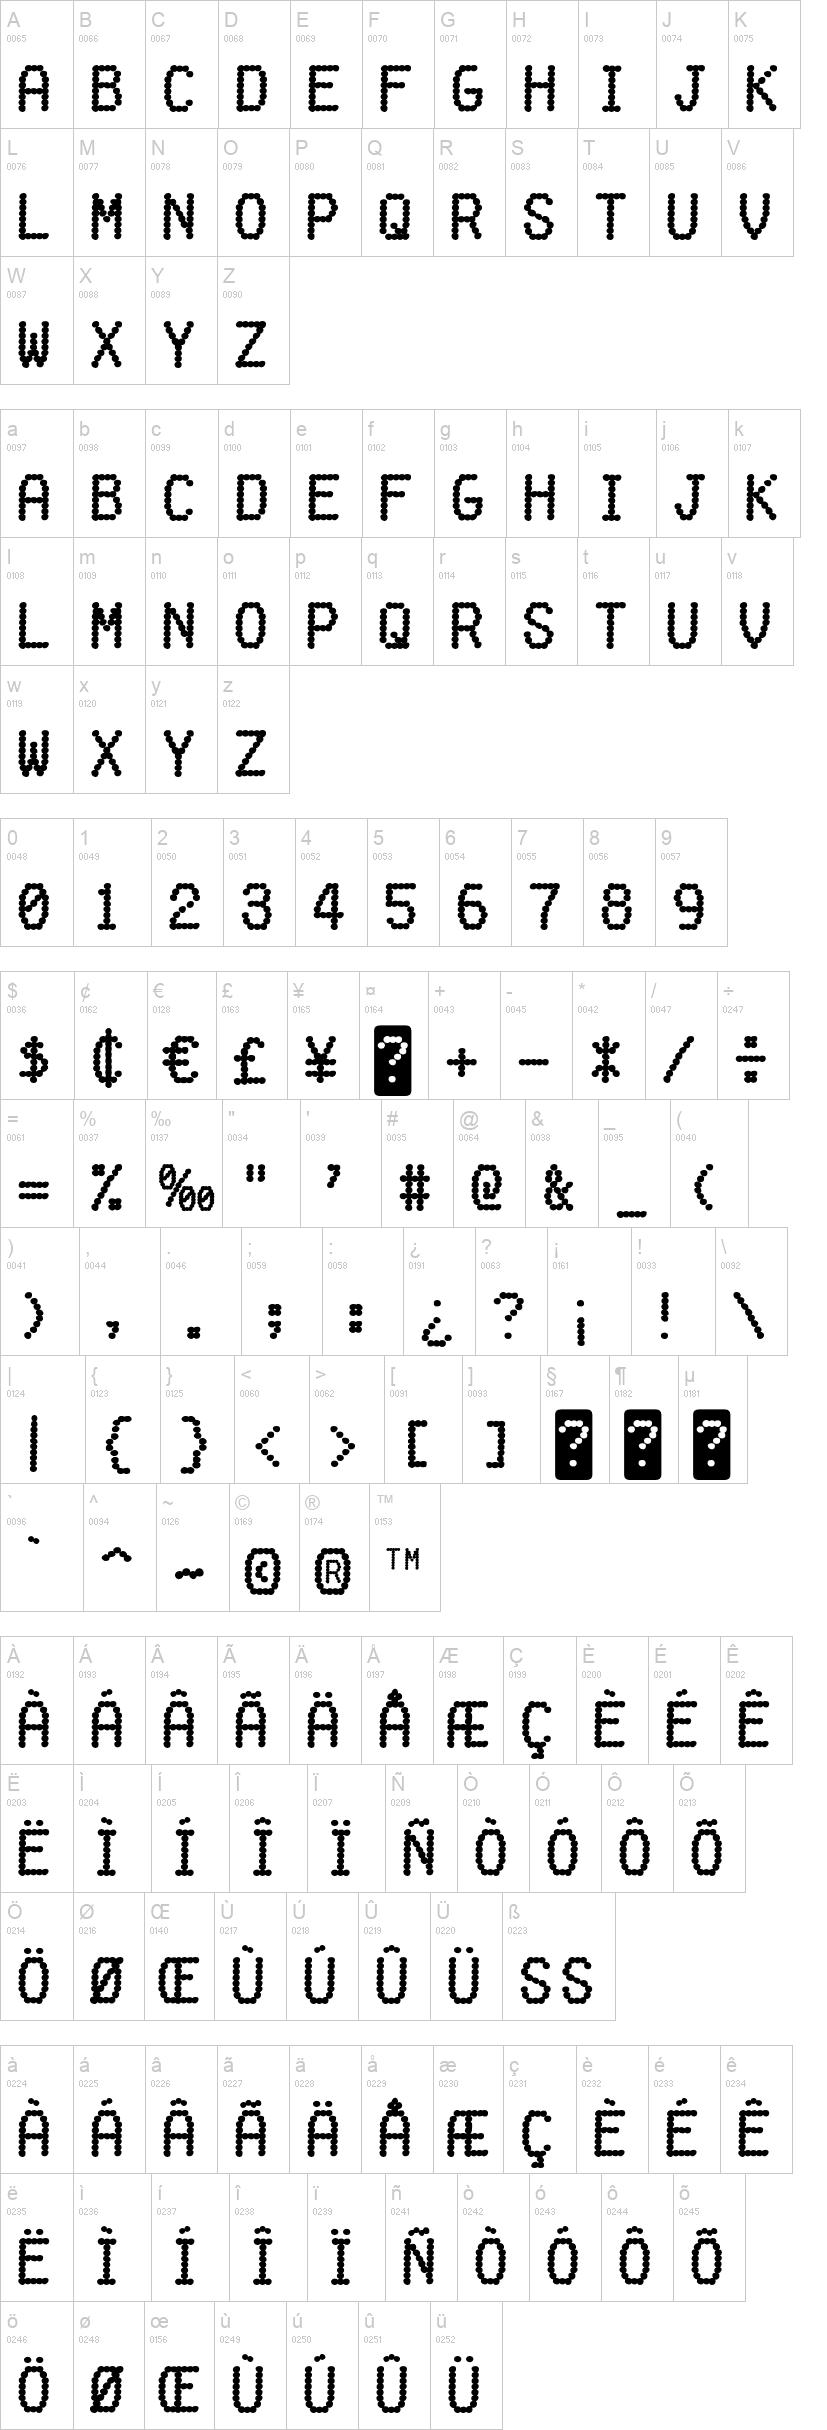 Fake Receipt Font – Receipt